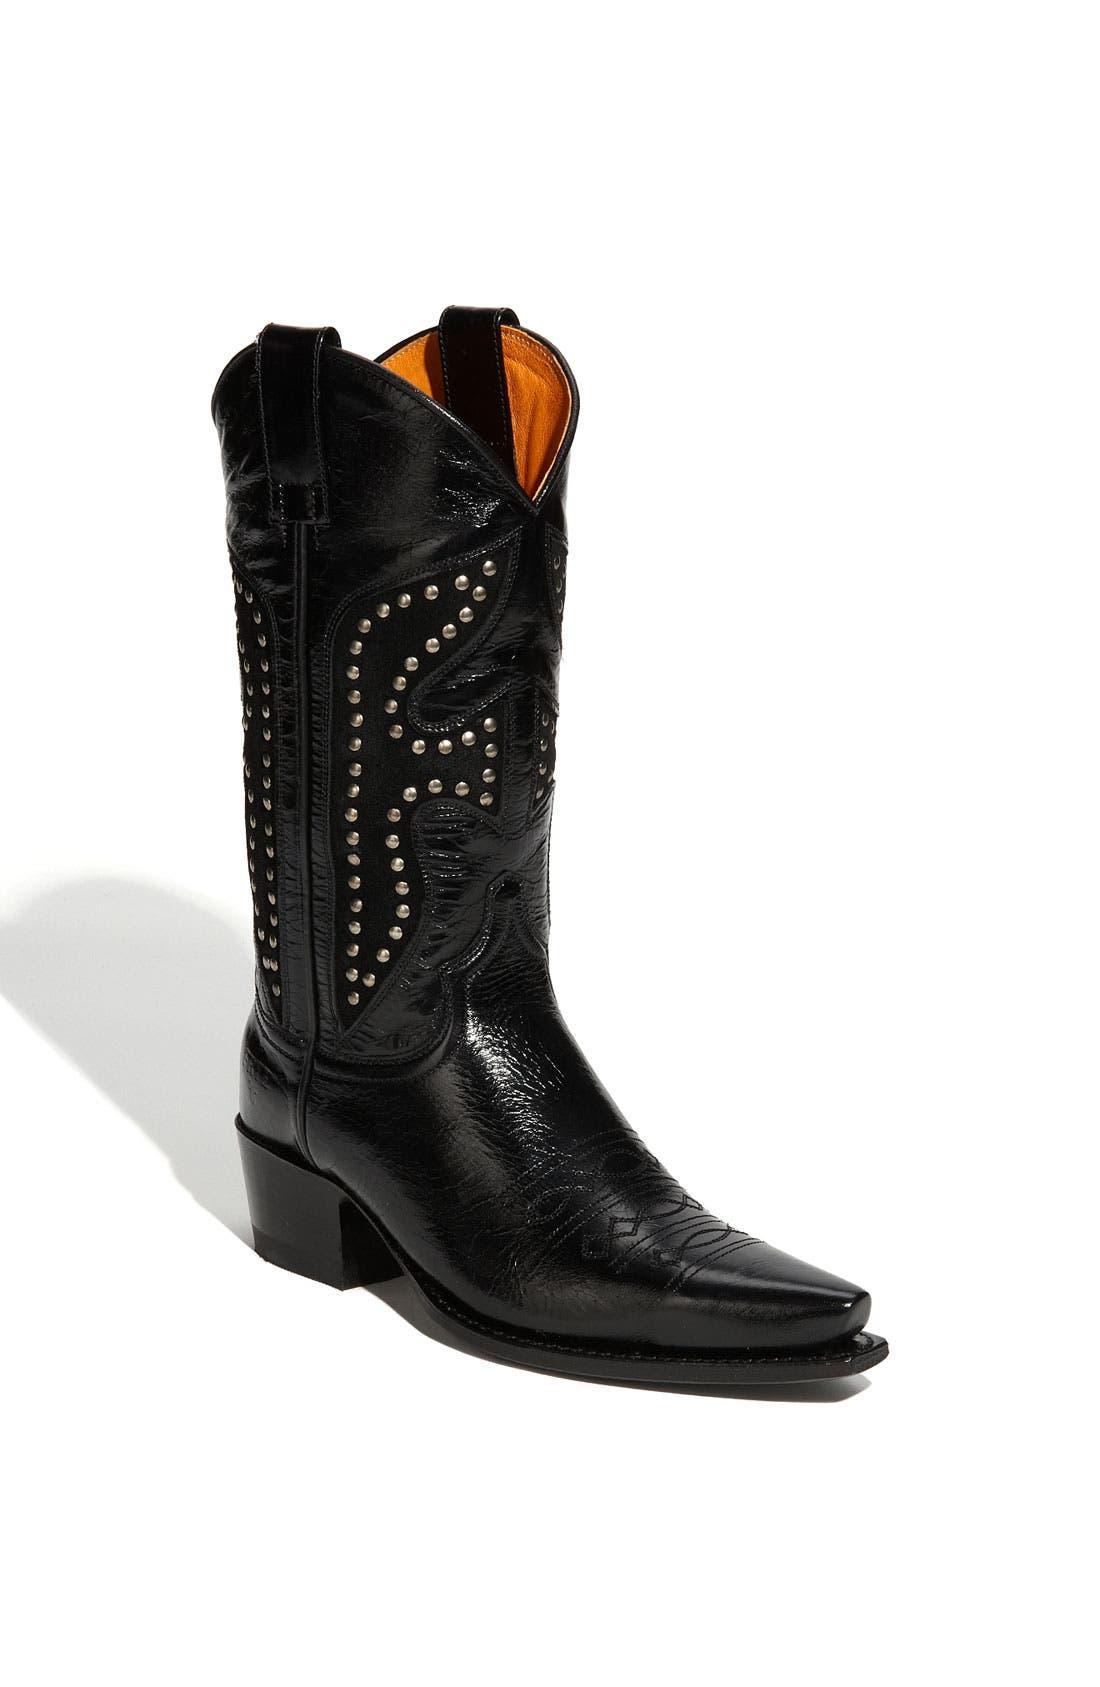 FRYE 'Daisy Duke' Studded Boot, Main, color, 001